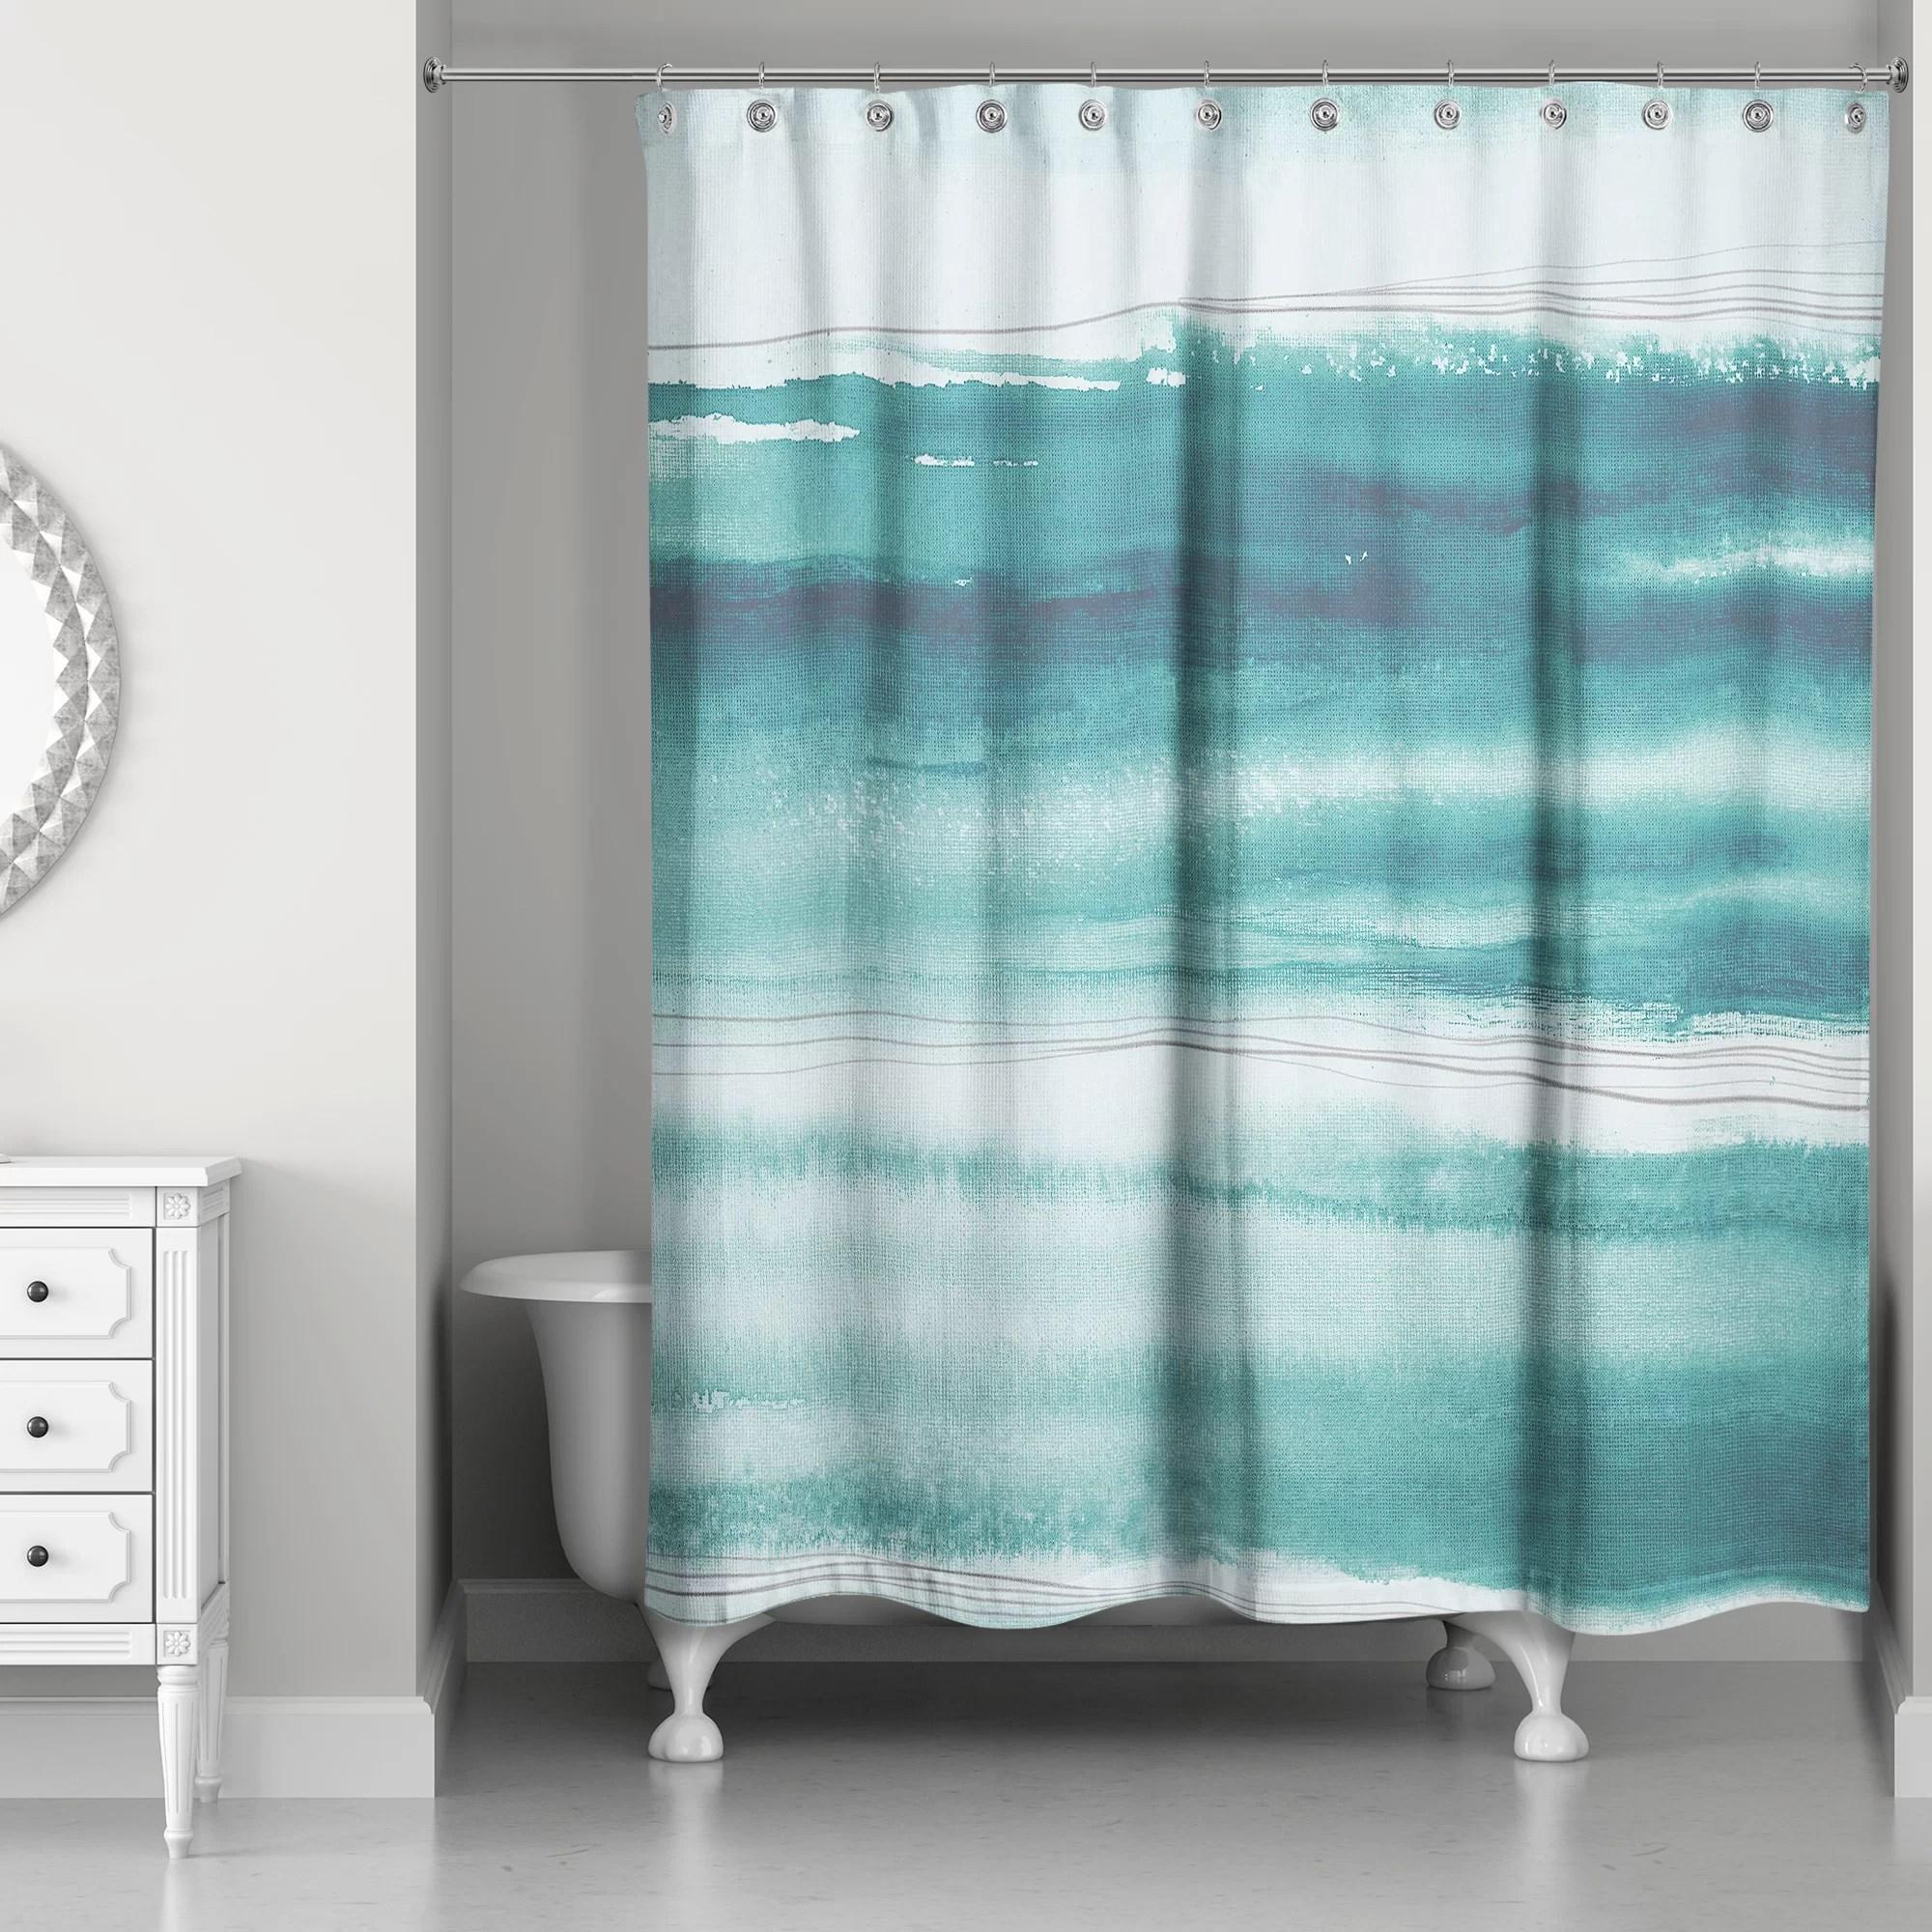 sherri abstract watercolor ocean single shower curtain